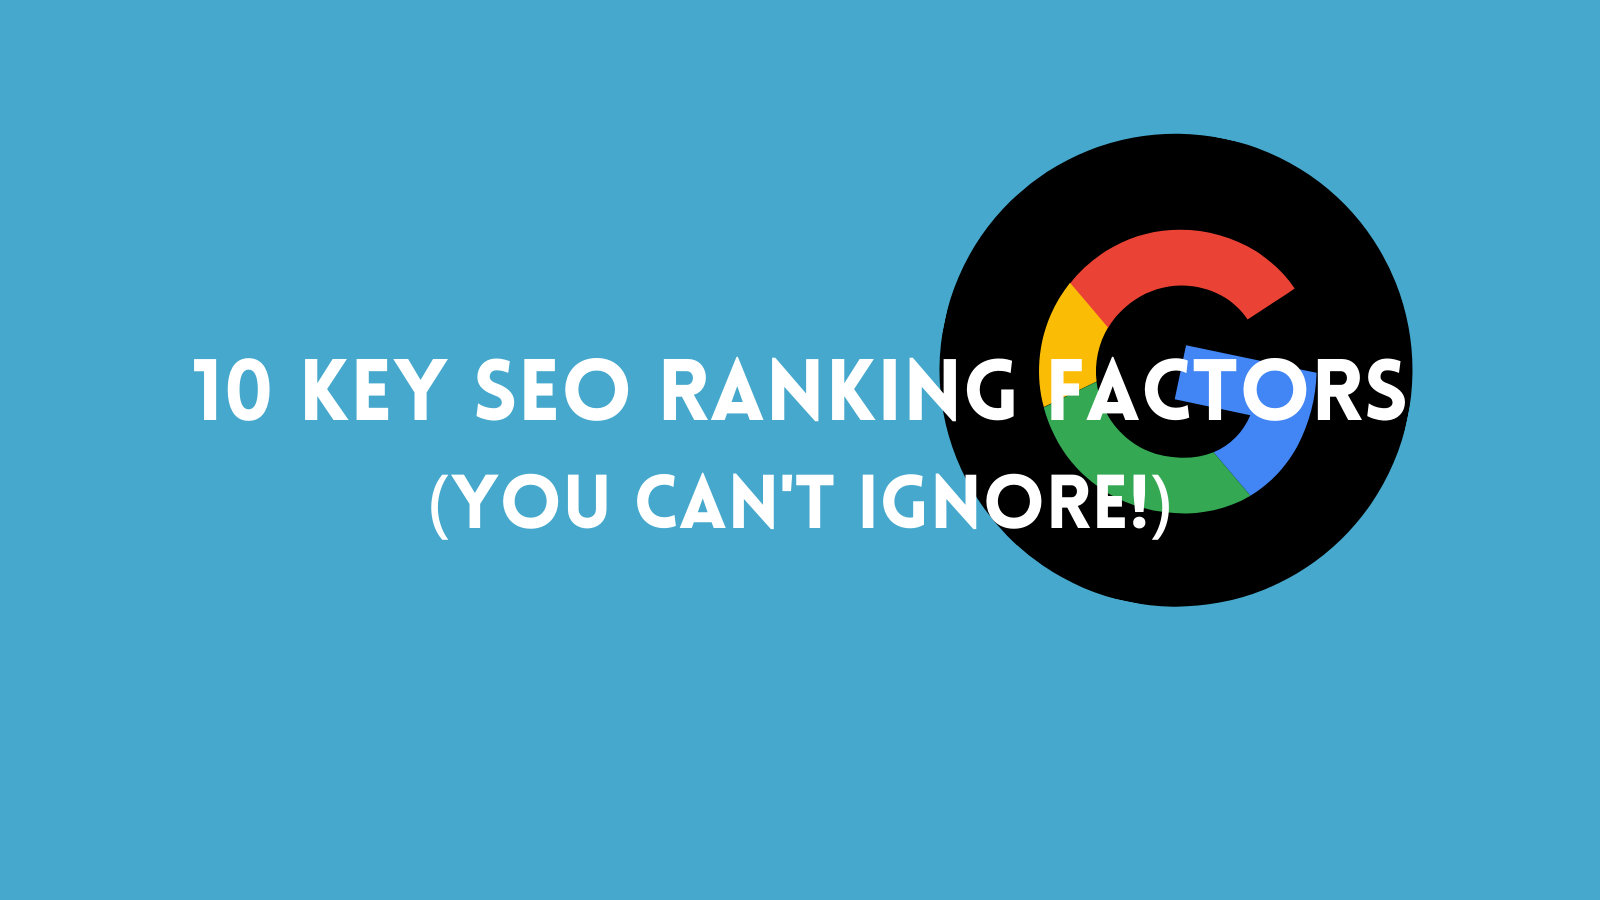 10 key seo ranking factors